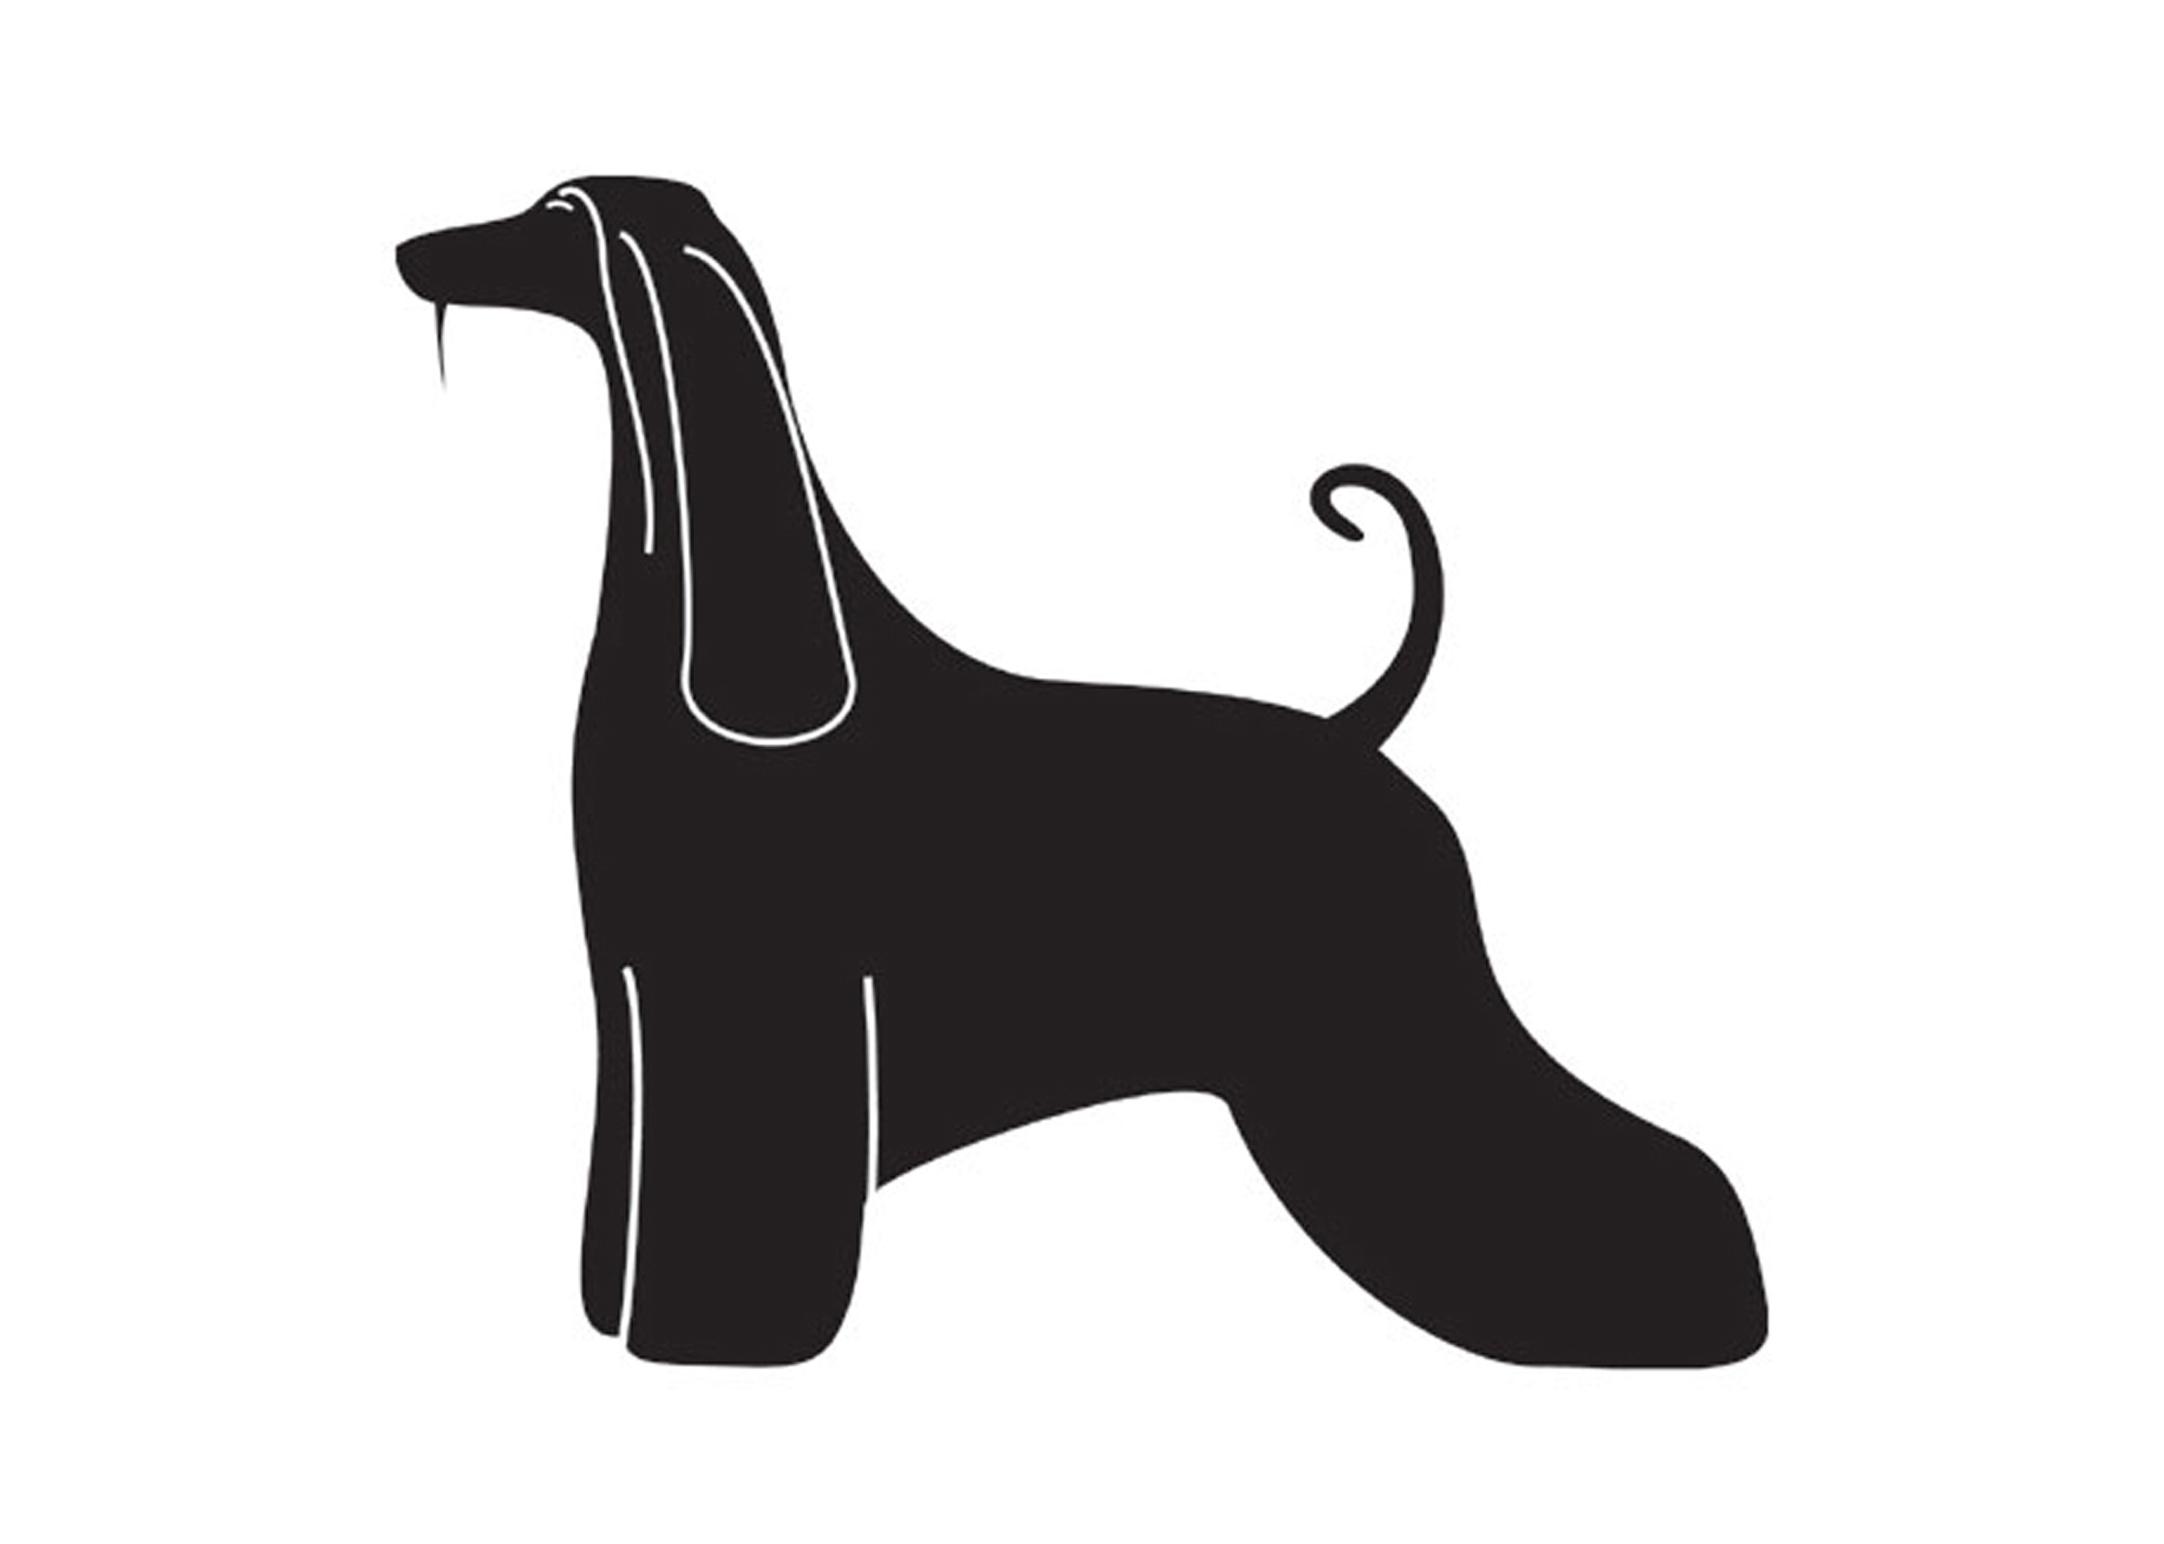 K-design Afghan Sticker For Groomers